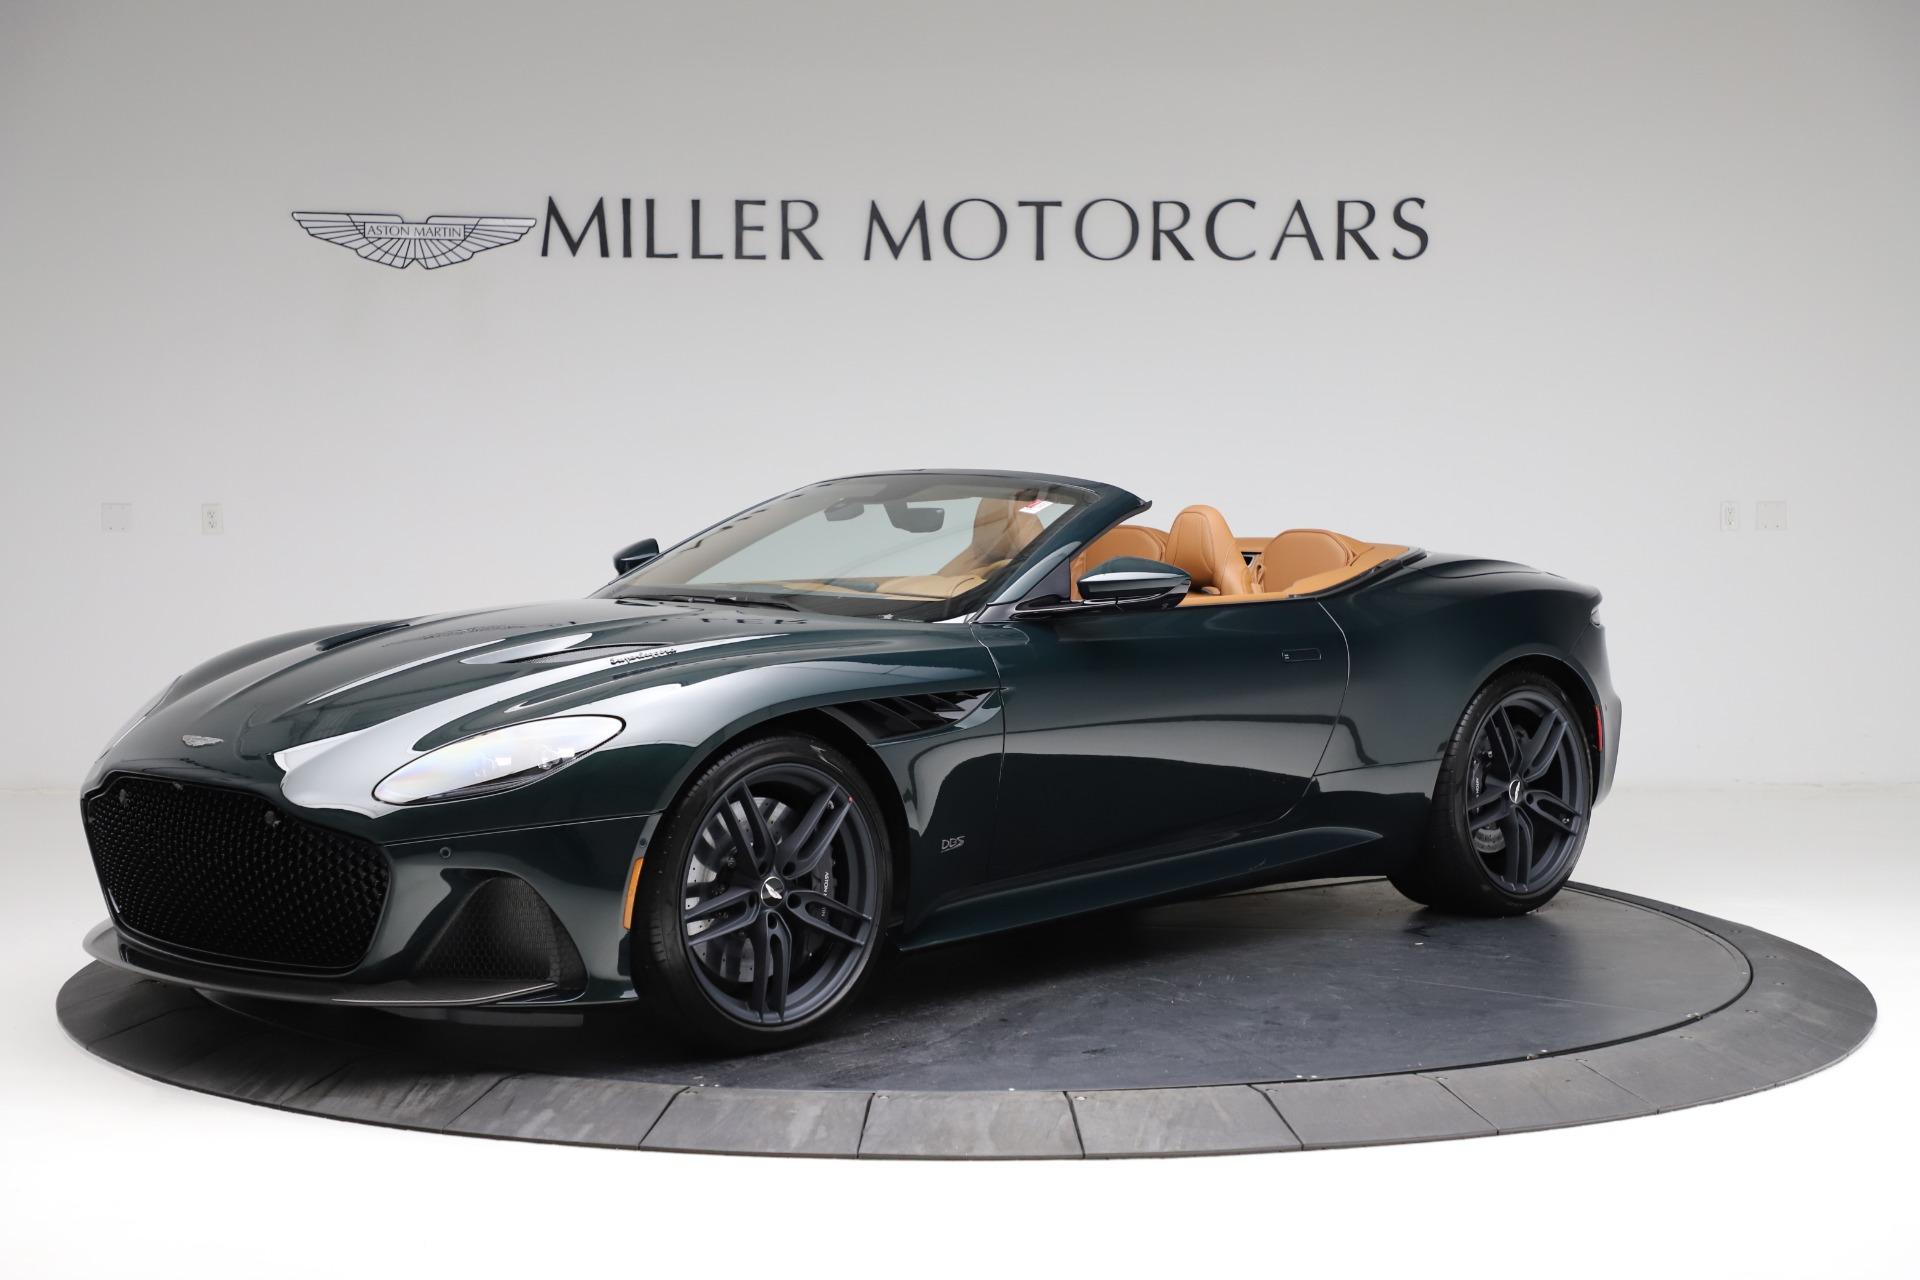 New 2021 Aston Martin DBS Superleggera Volante for sale Sold at Pagani of Greenwich in Greenwich CT 06830 1